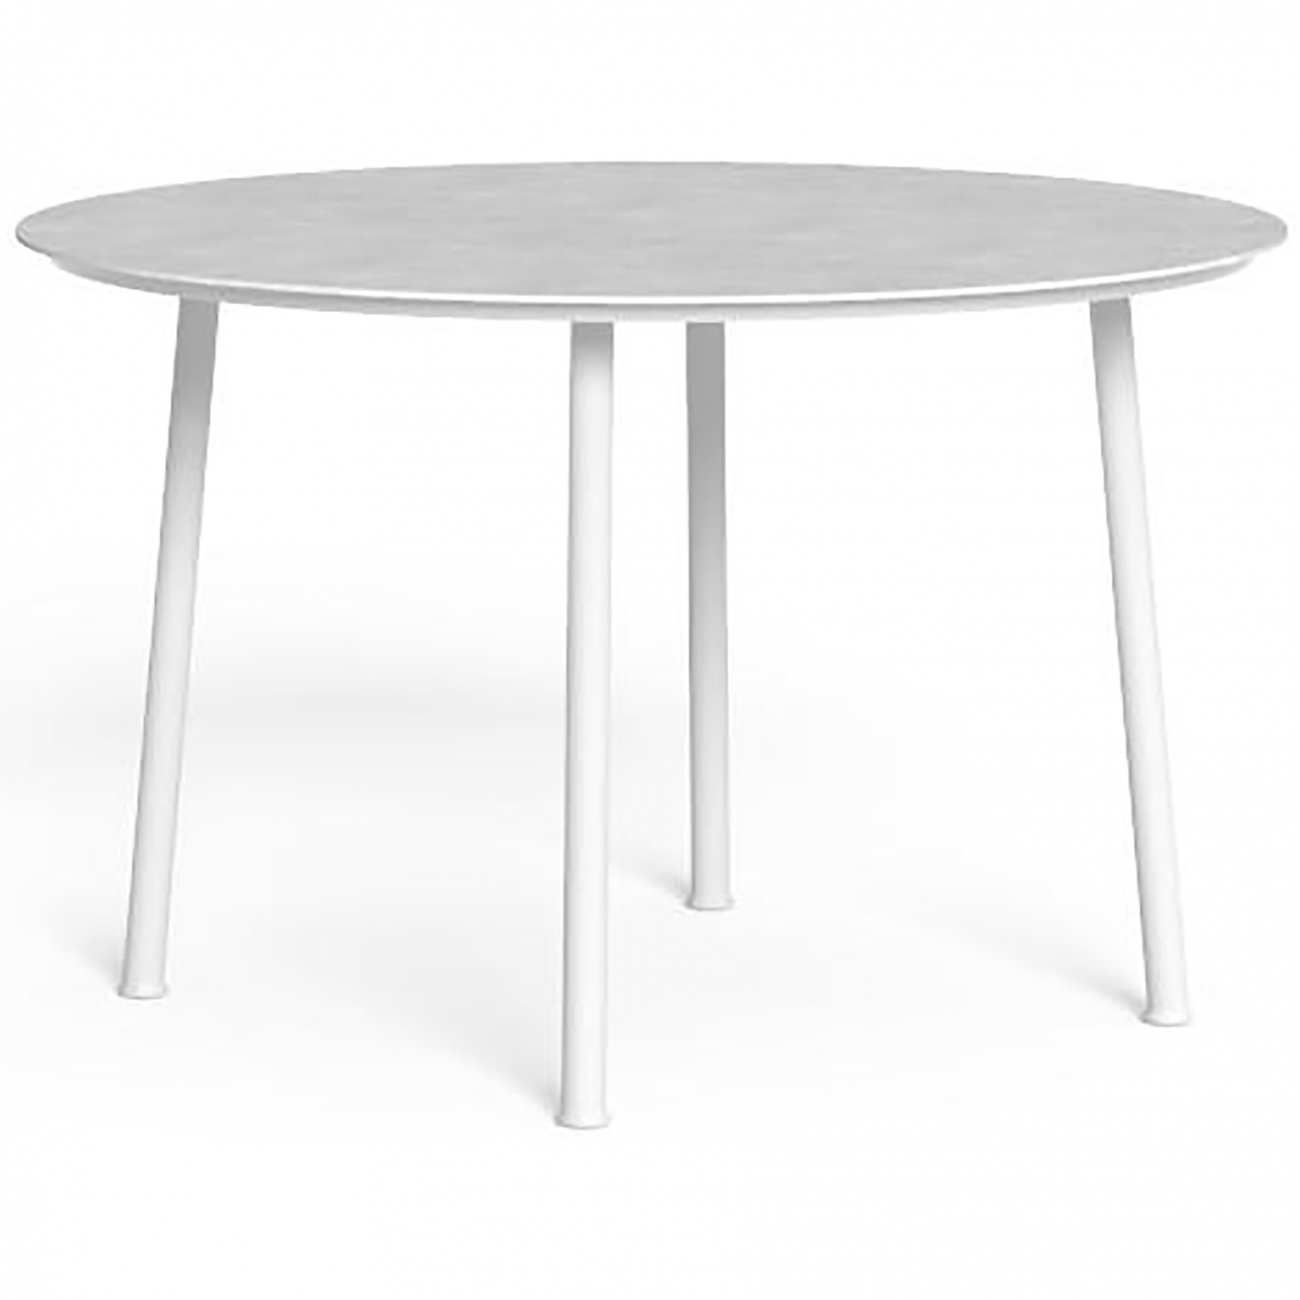 Talenti Slam round dining table